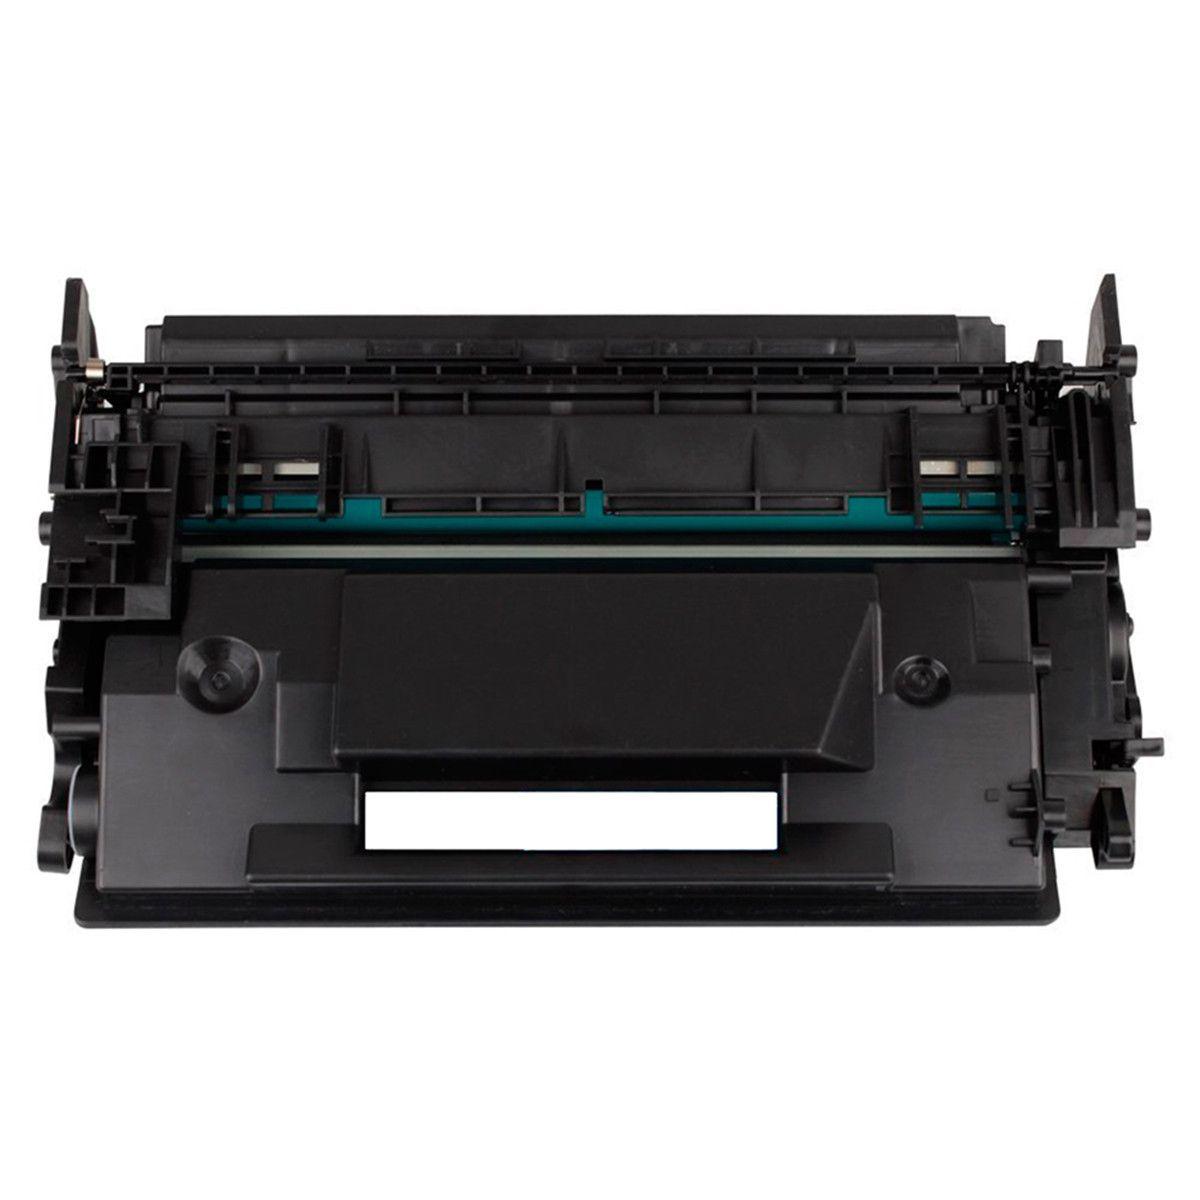 Toner Compatível HP CF287A CF287AB | M501 M506N M506DN M506X M527F M527DN M527Z | 9.000 Páginas - Cartucho & Cia